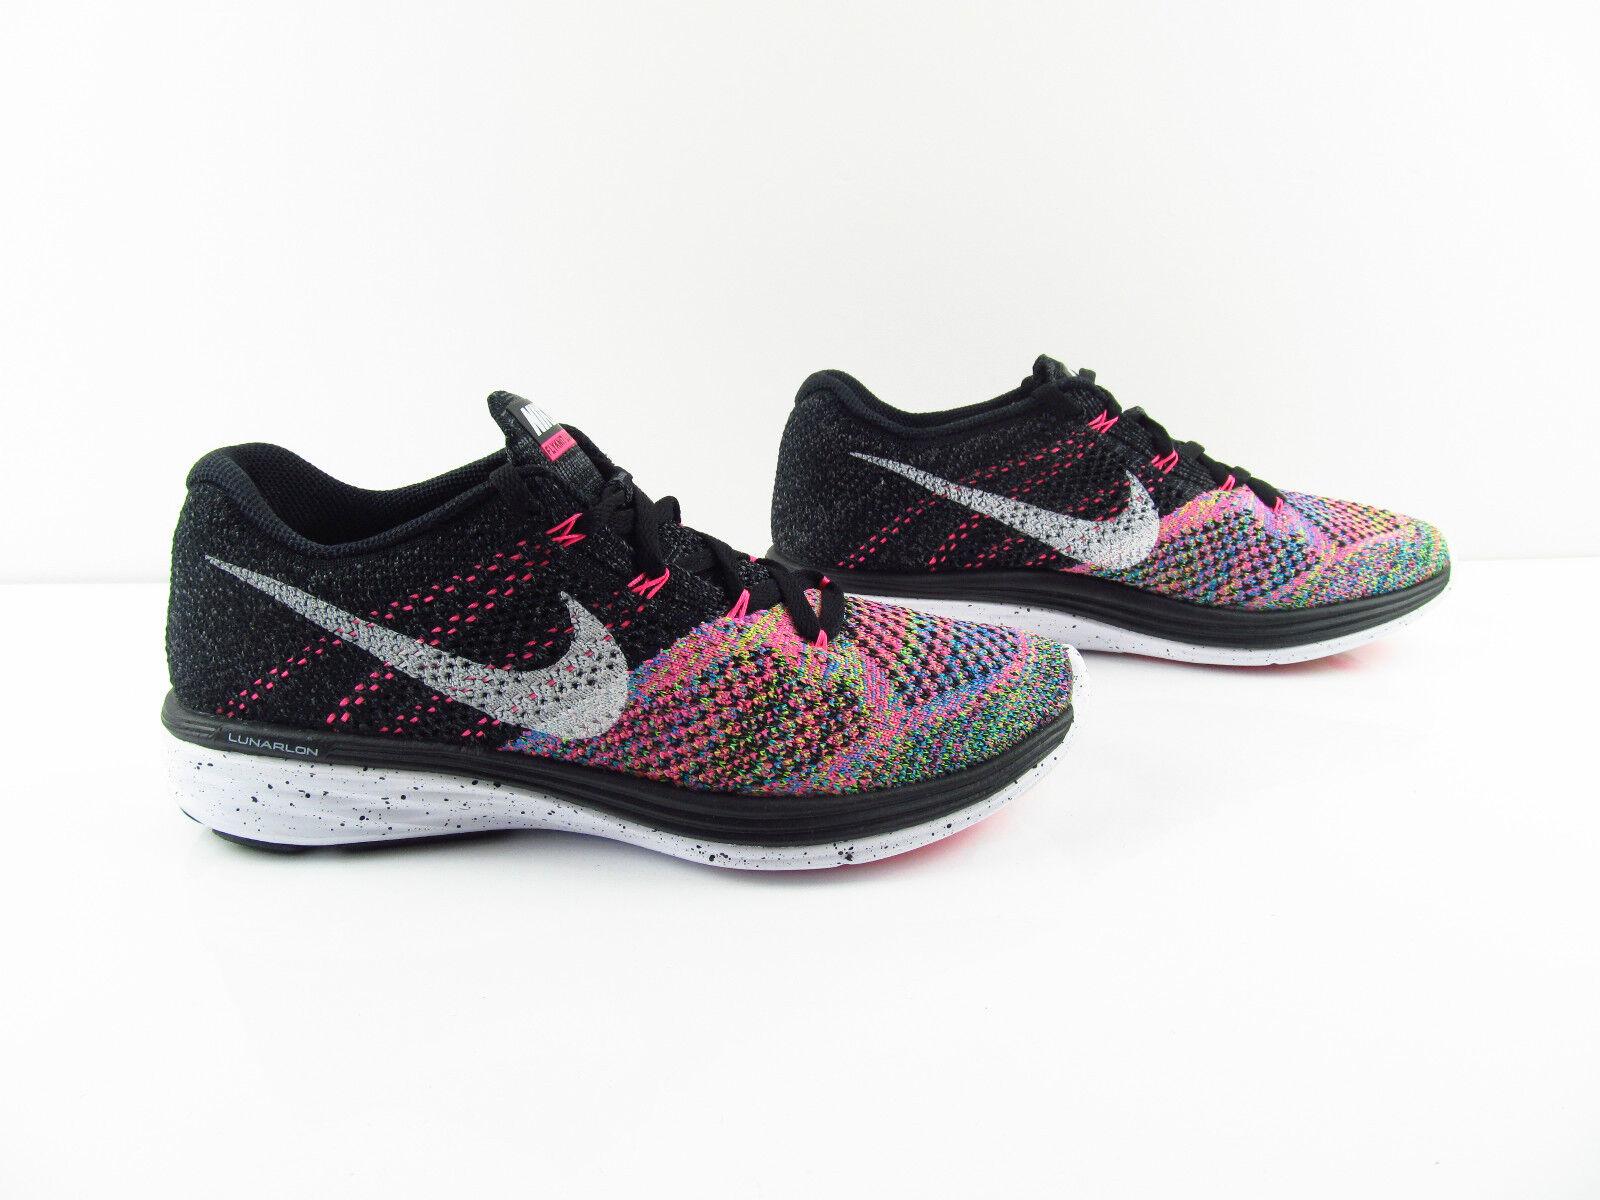 Nike Wmns Flyknit Lunar3 MultiFarbe Rosa Pow US_8 UK 5.5 Eur 39  | Elegante und robuste Verpackung